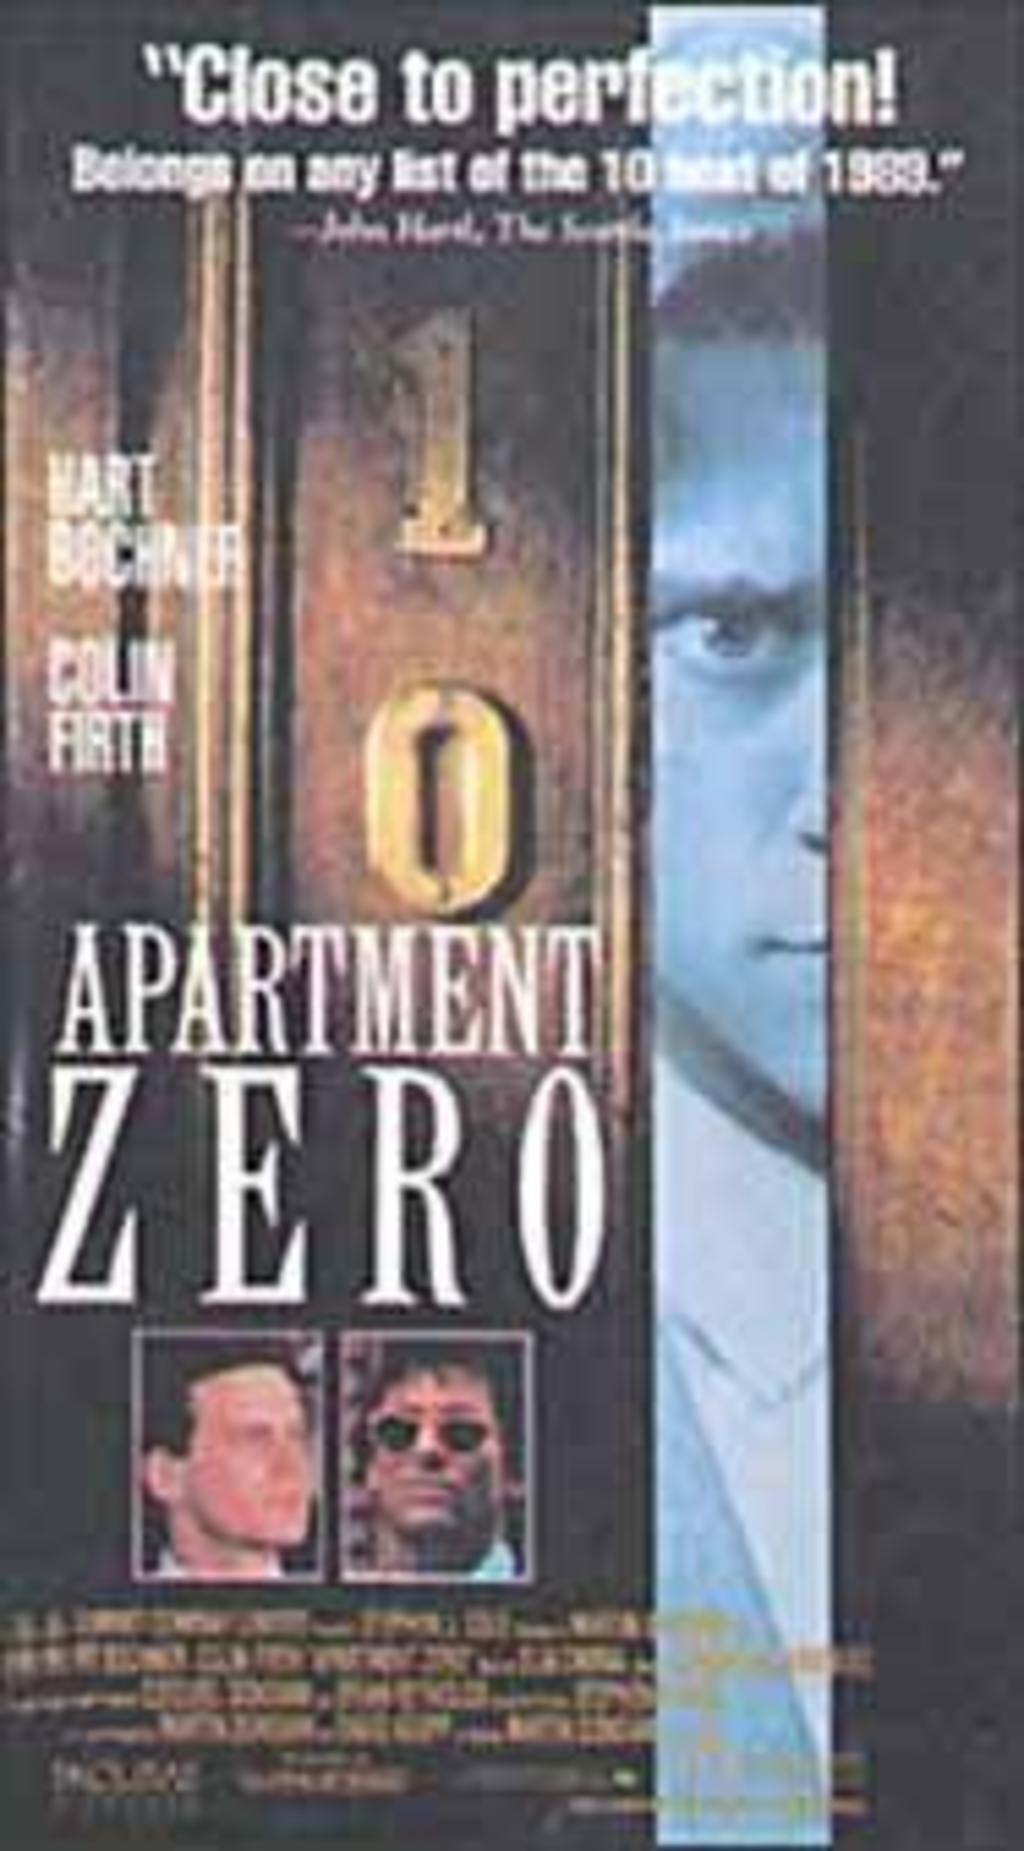 watch apartment zero on netflix today netflixmoviescom